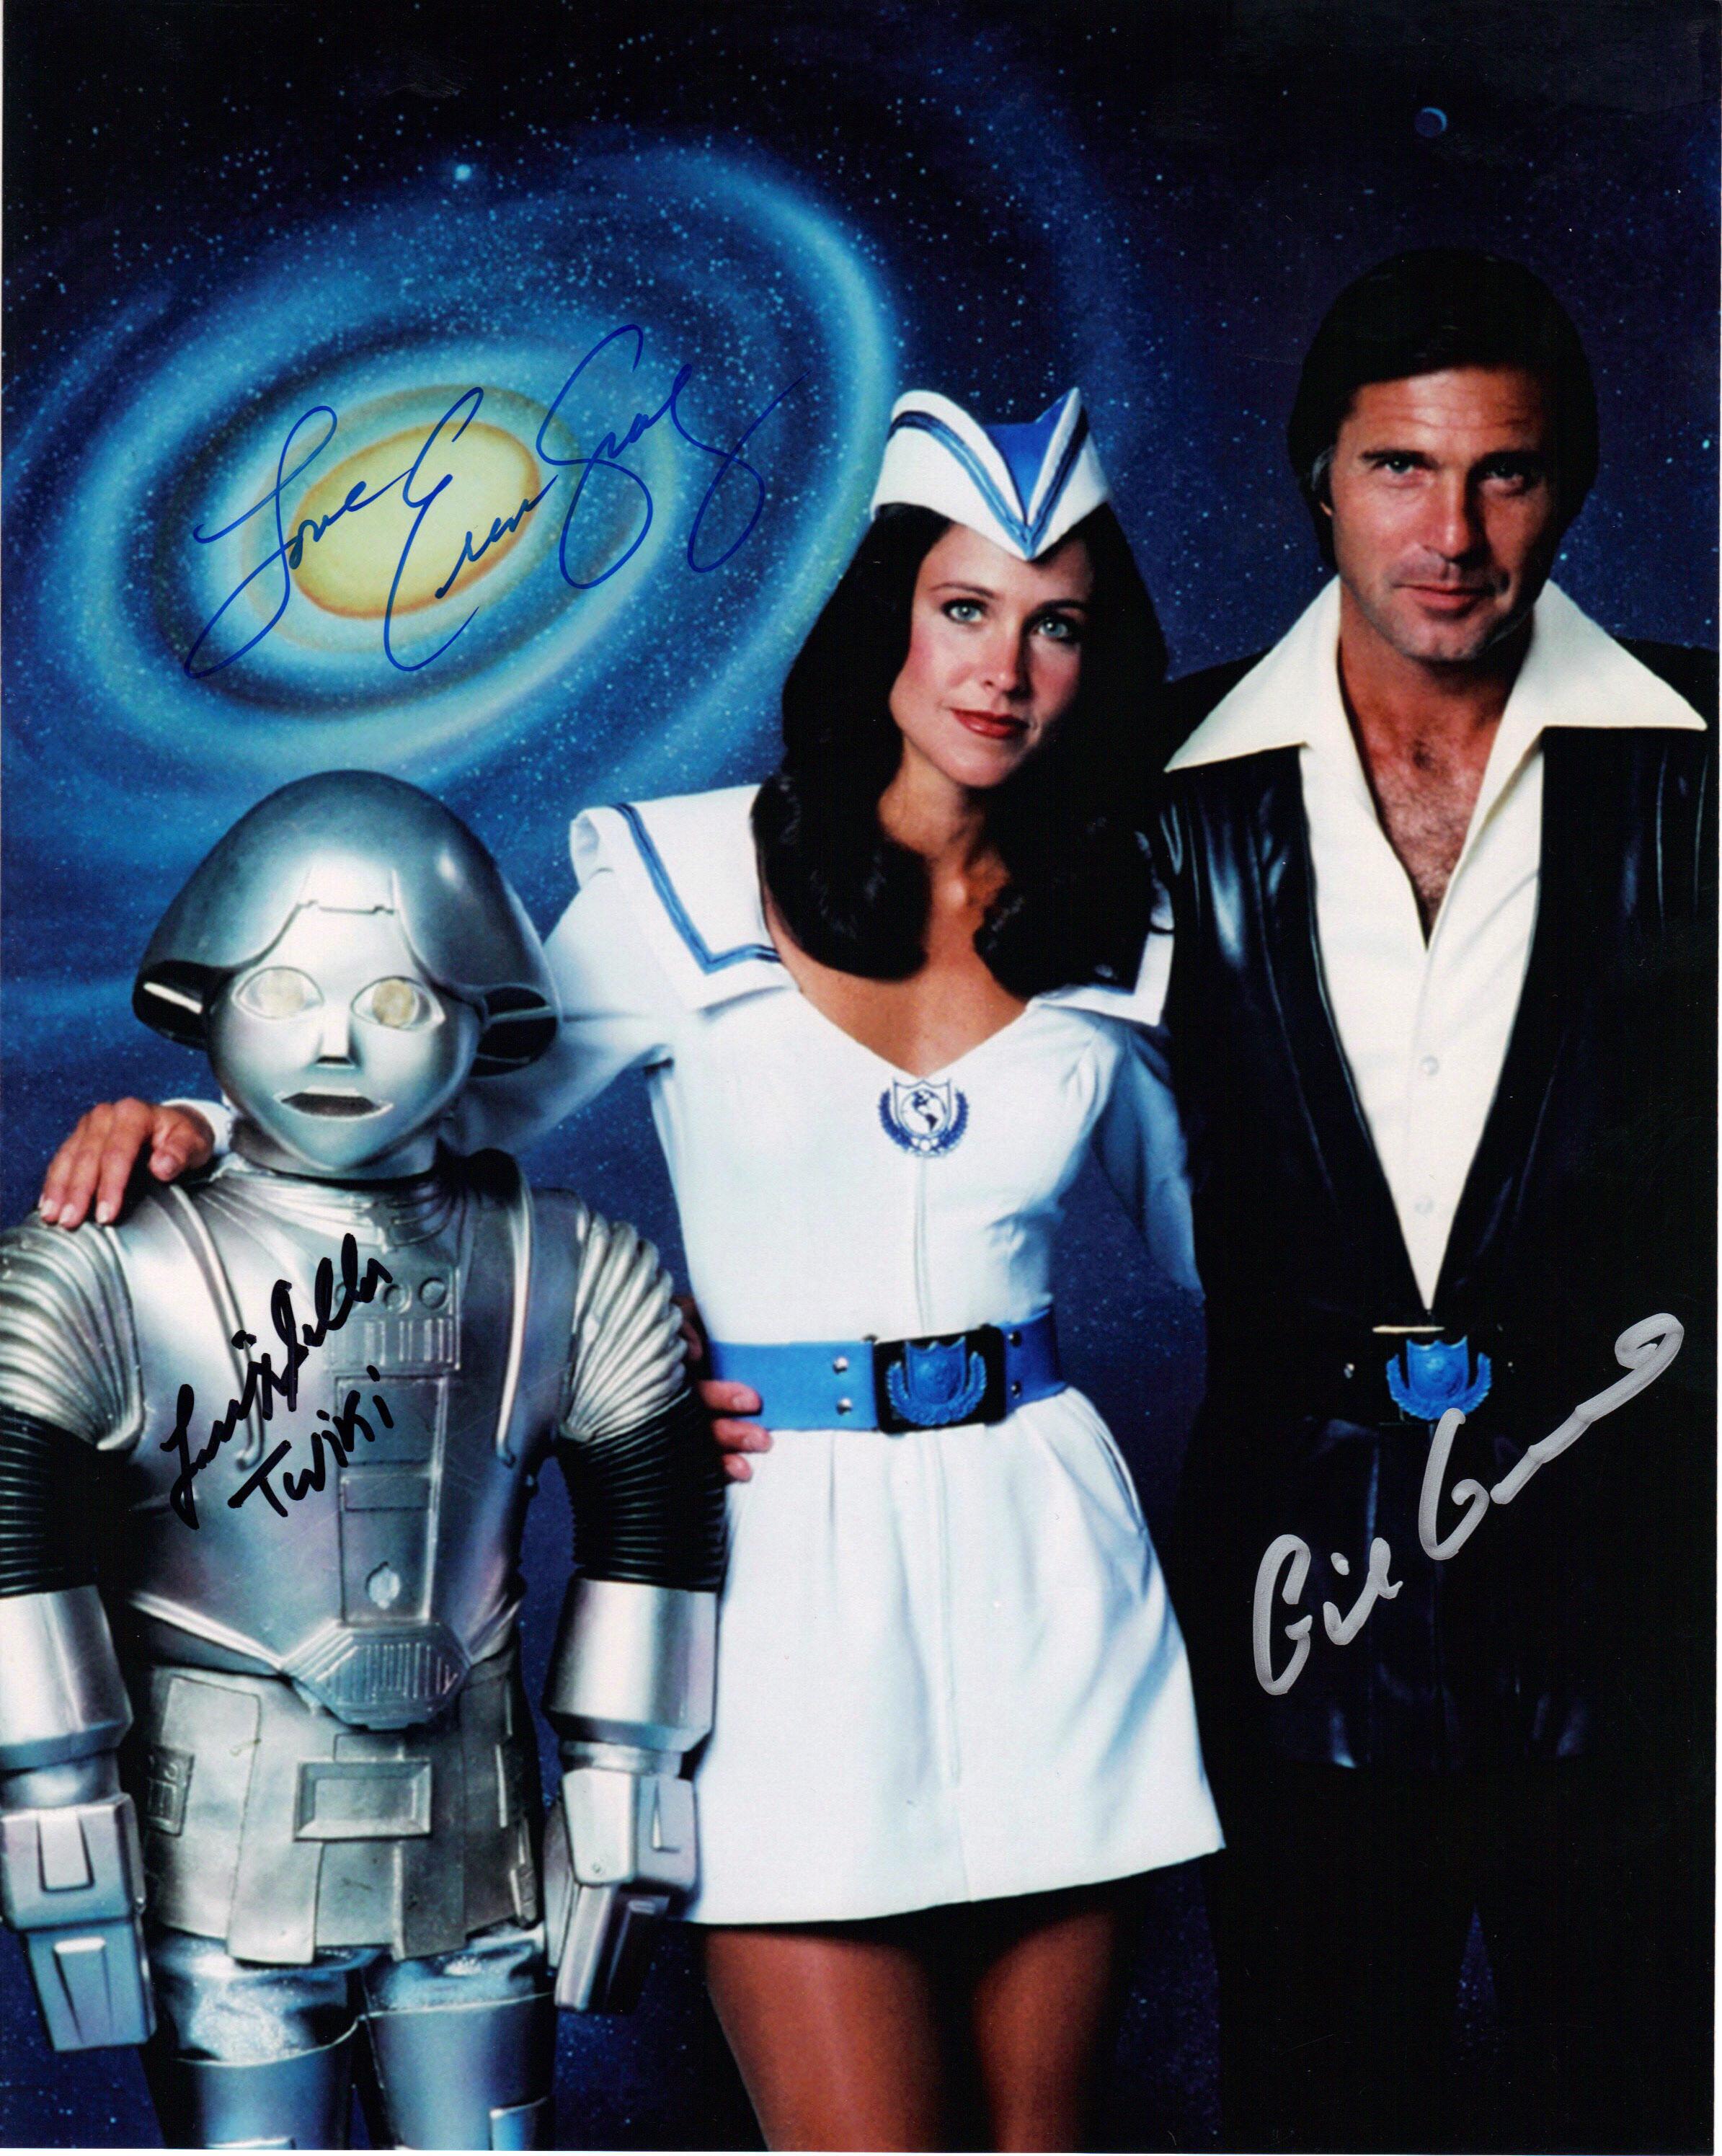 Buck Rogers cast of 3